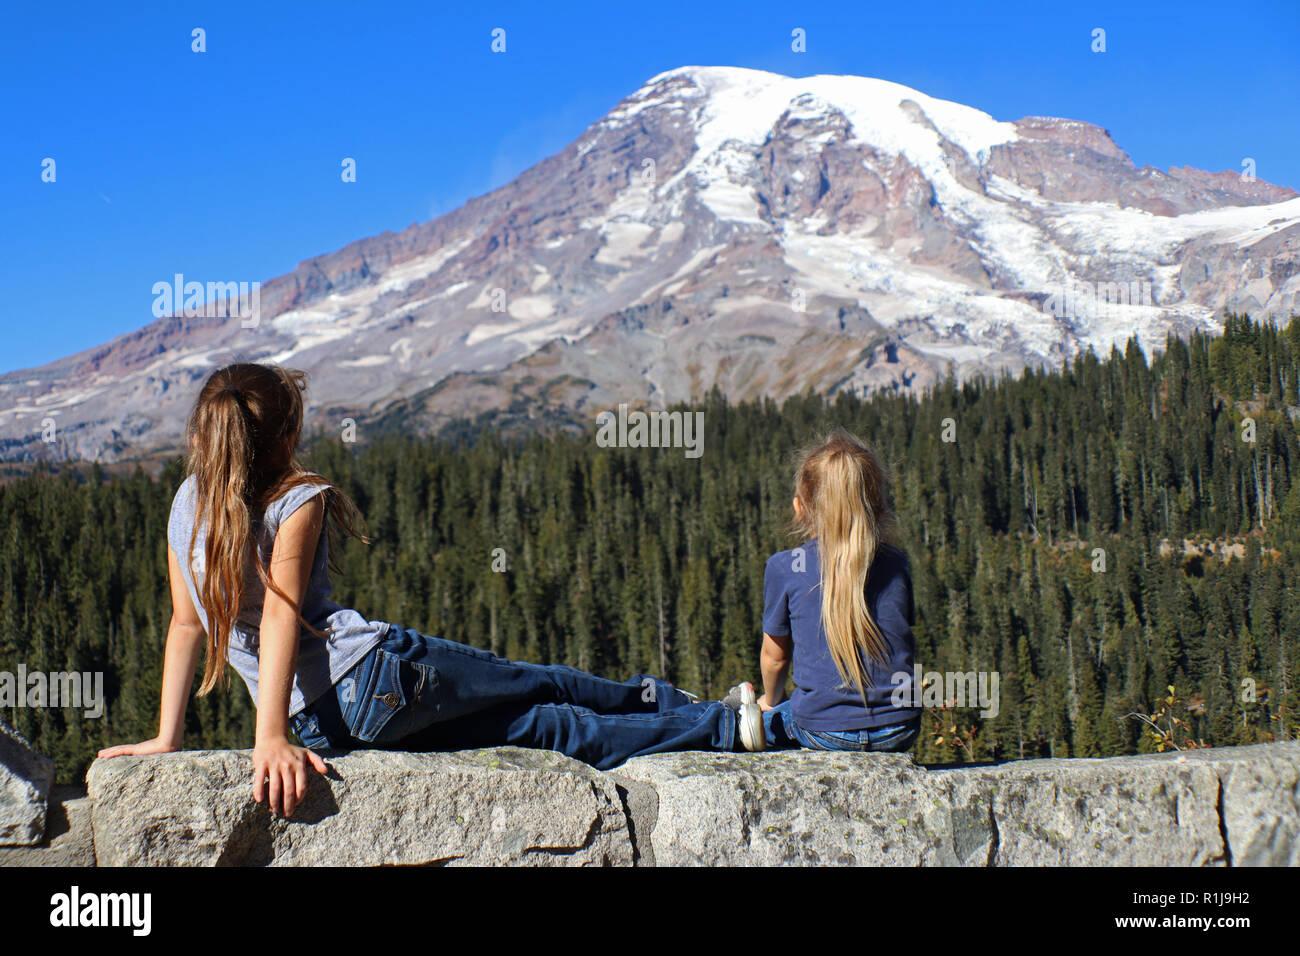 Two children enjoying the amazing view of Mount Rainier - Stock Image